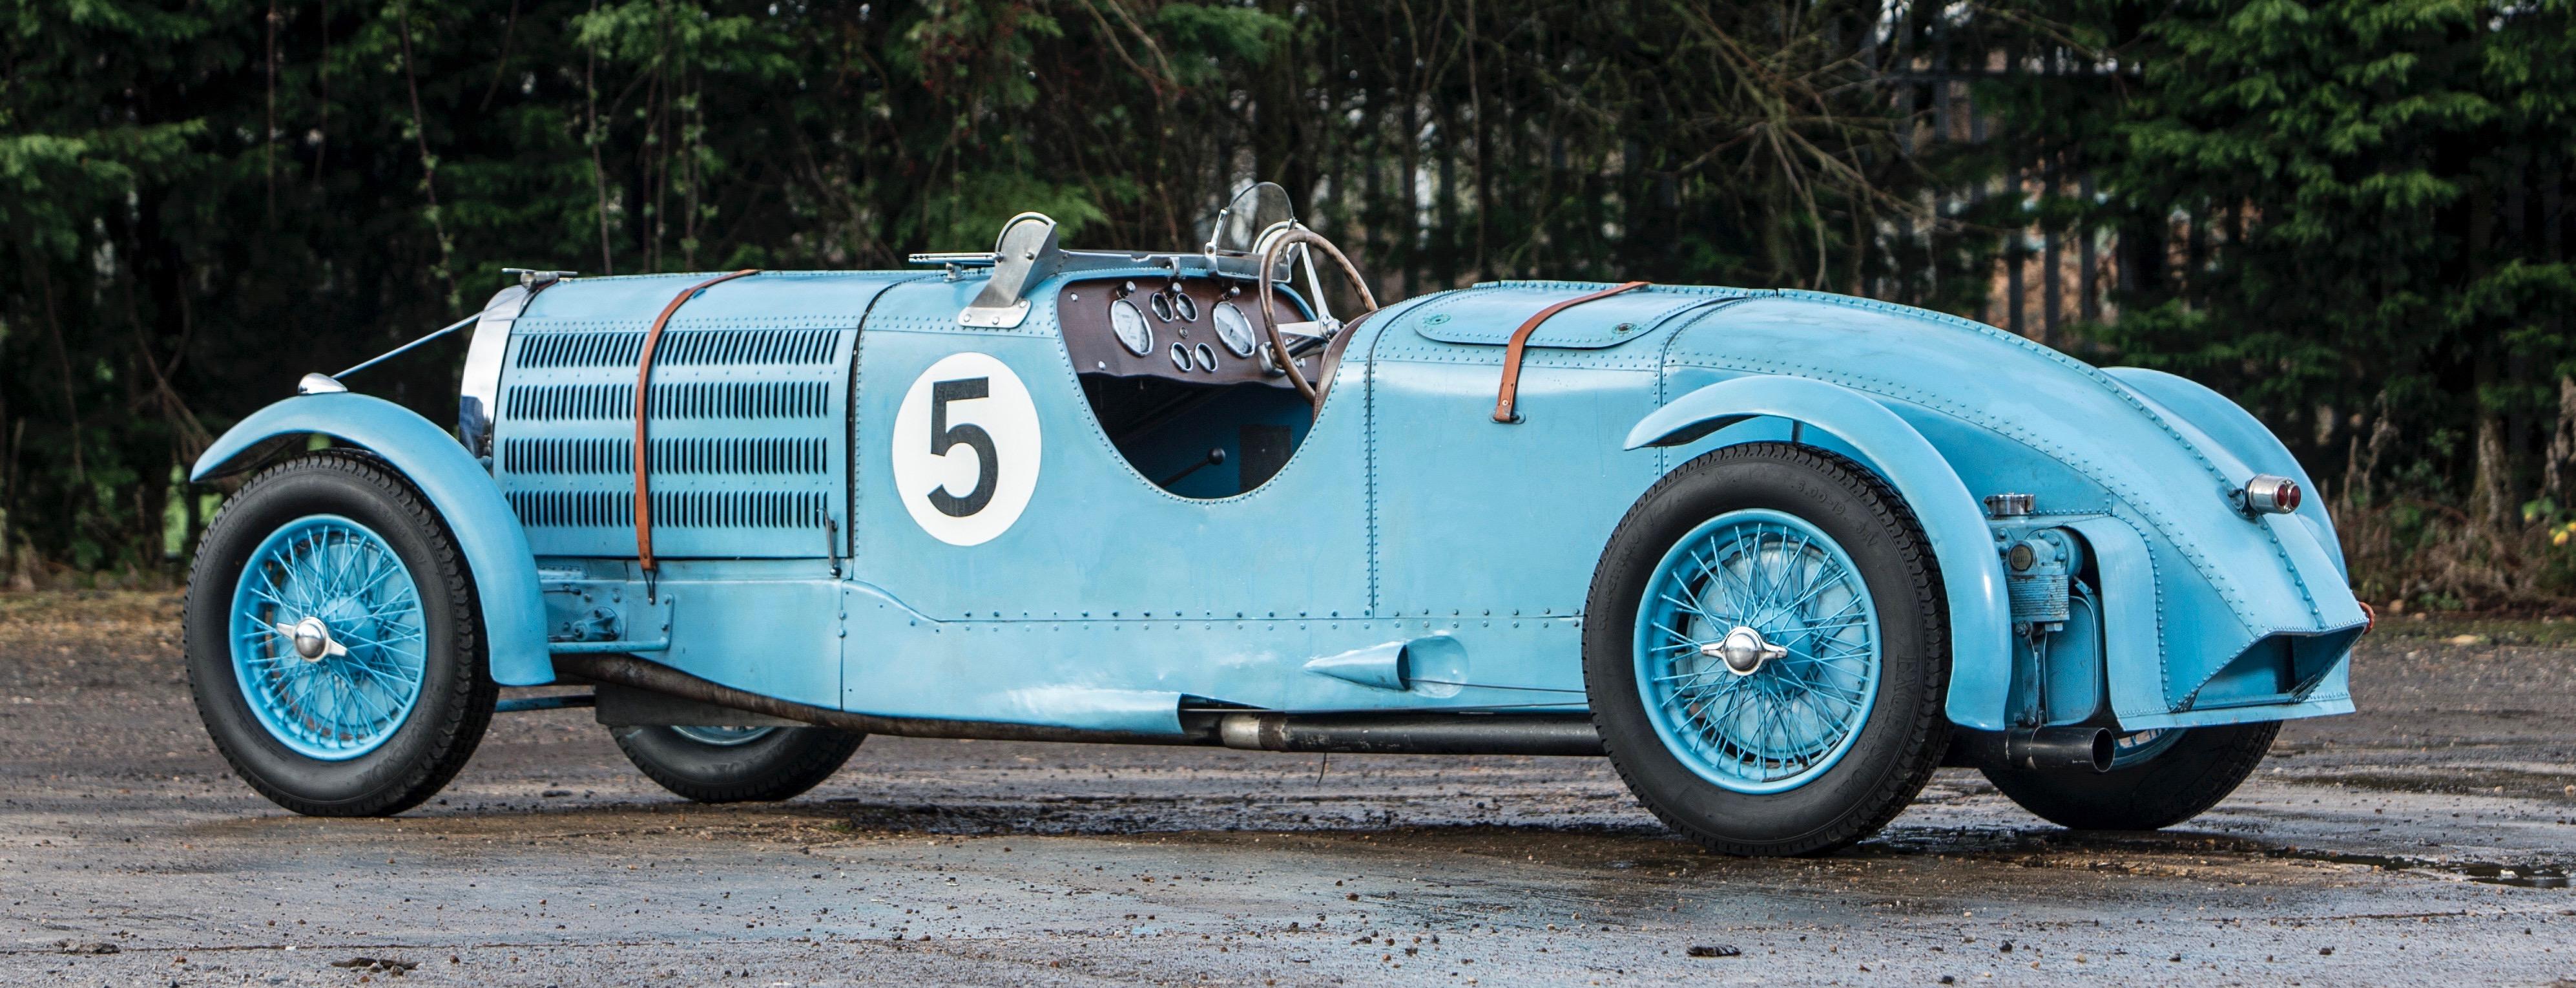 Bugatti, 1935 Bugatti Type 57T with long racing history added to Bonhams' Paris docket, ClassicCars.com Journal